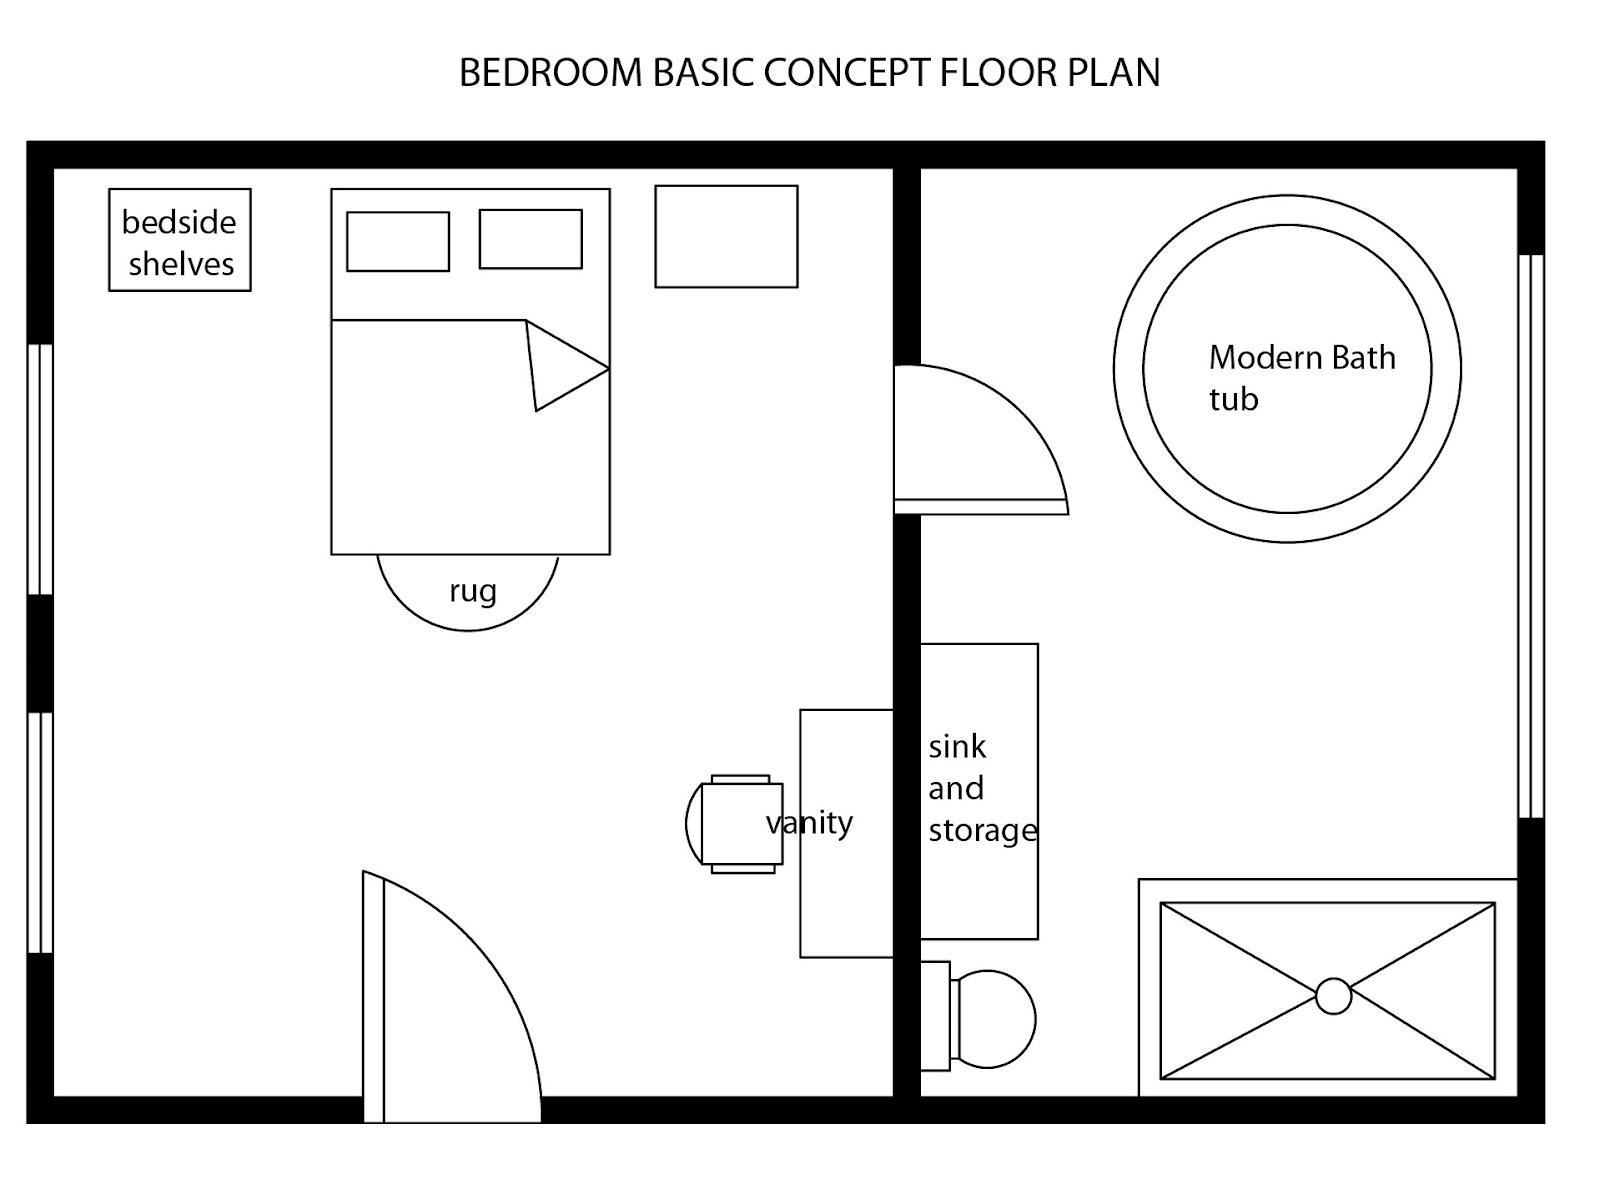 INTERIOR DESIGN & DECOR: MODERN BEDROOM BASIC FLOOR PLAN